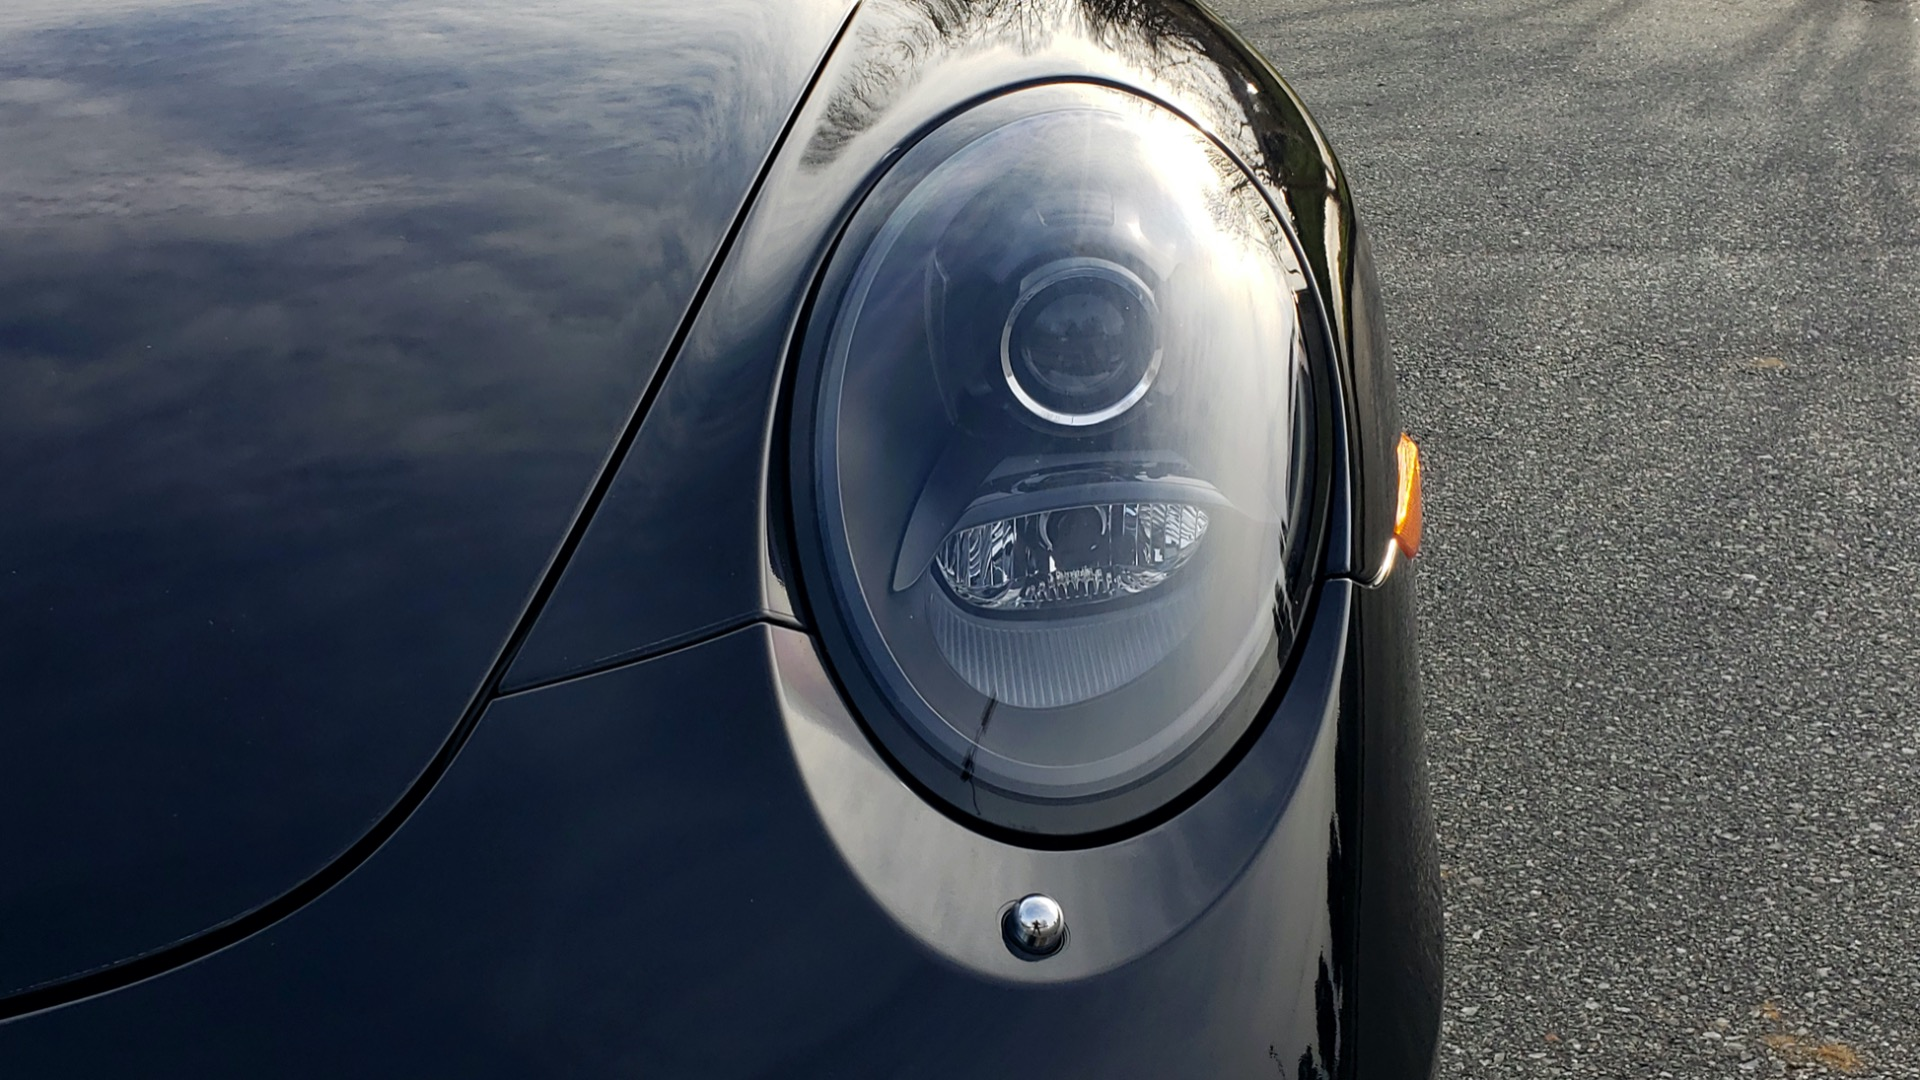 Used 2014 Porsche 911 CARRERA 4S / PREM PKG PLUS / NAV / SUNROO / BOSE / CHRONO for sale Sold at Formula Imports in Charlotte NC 28227 13